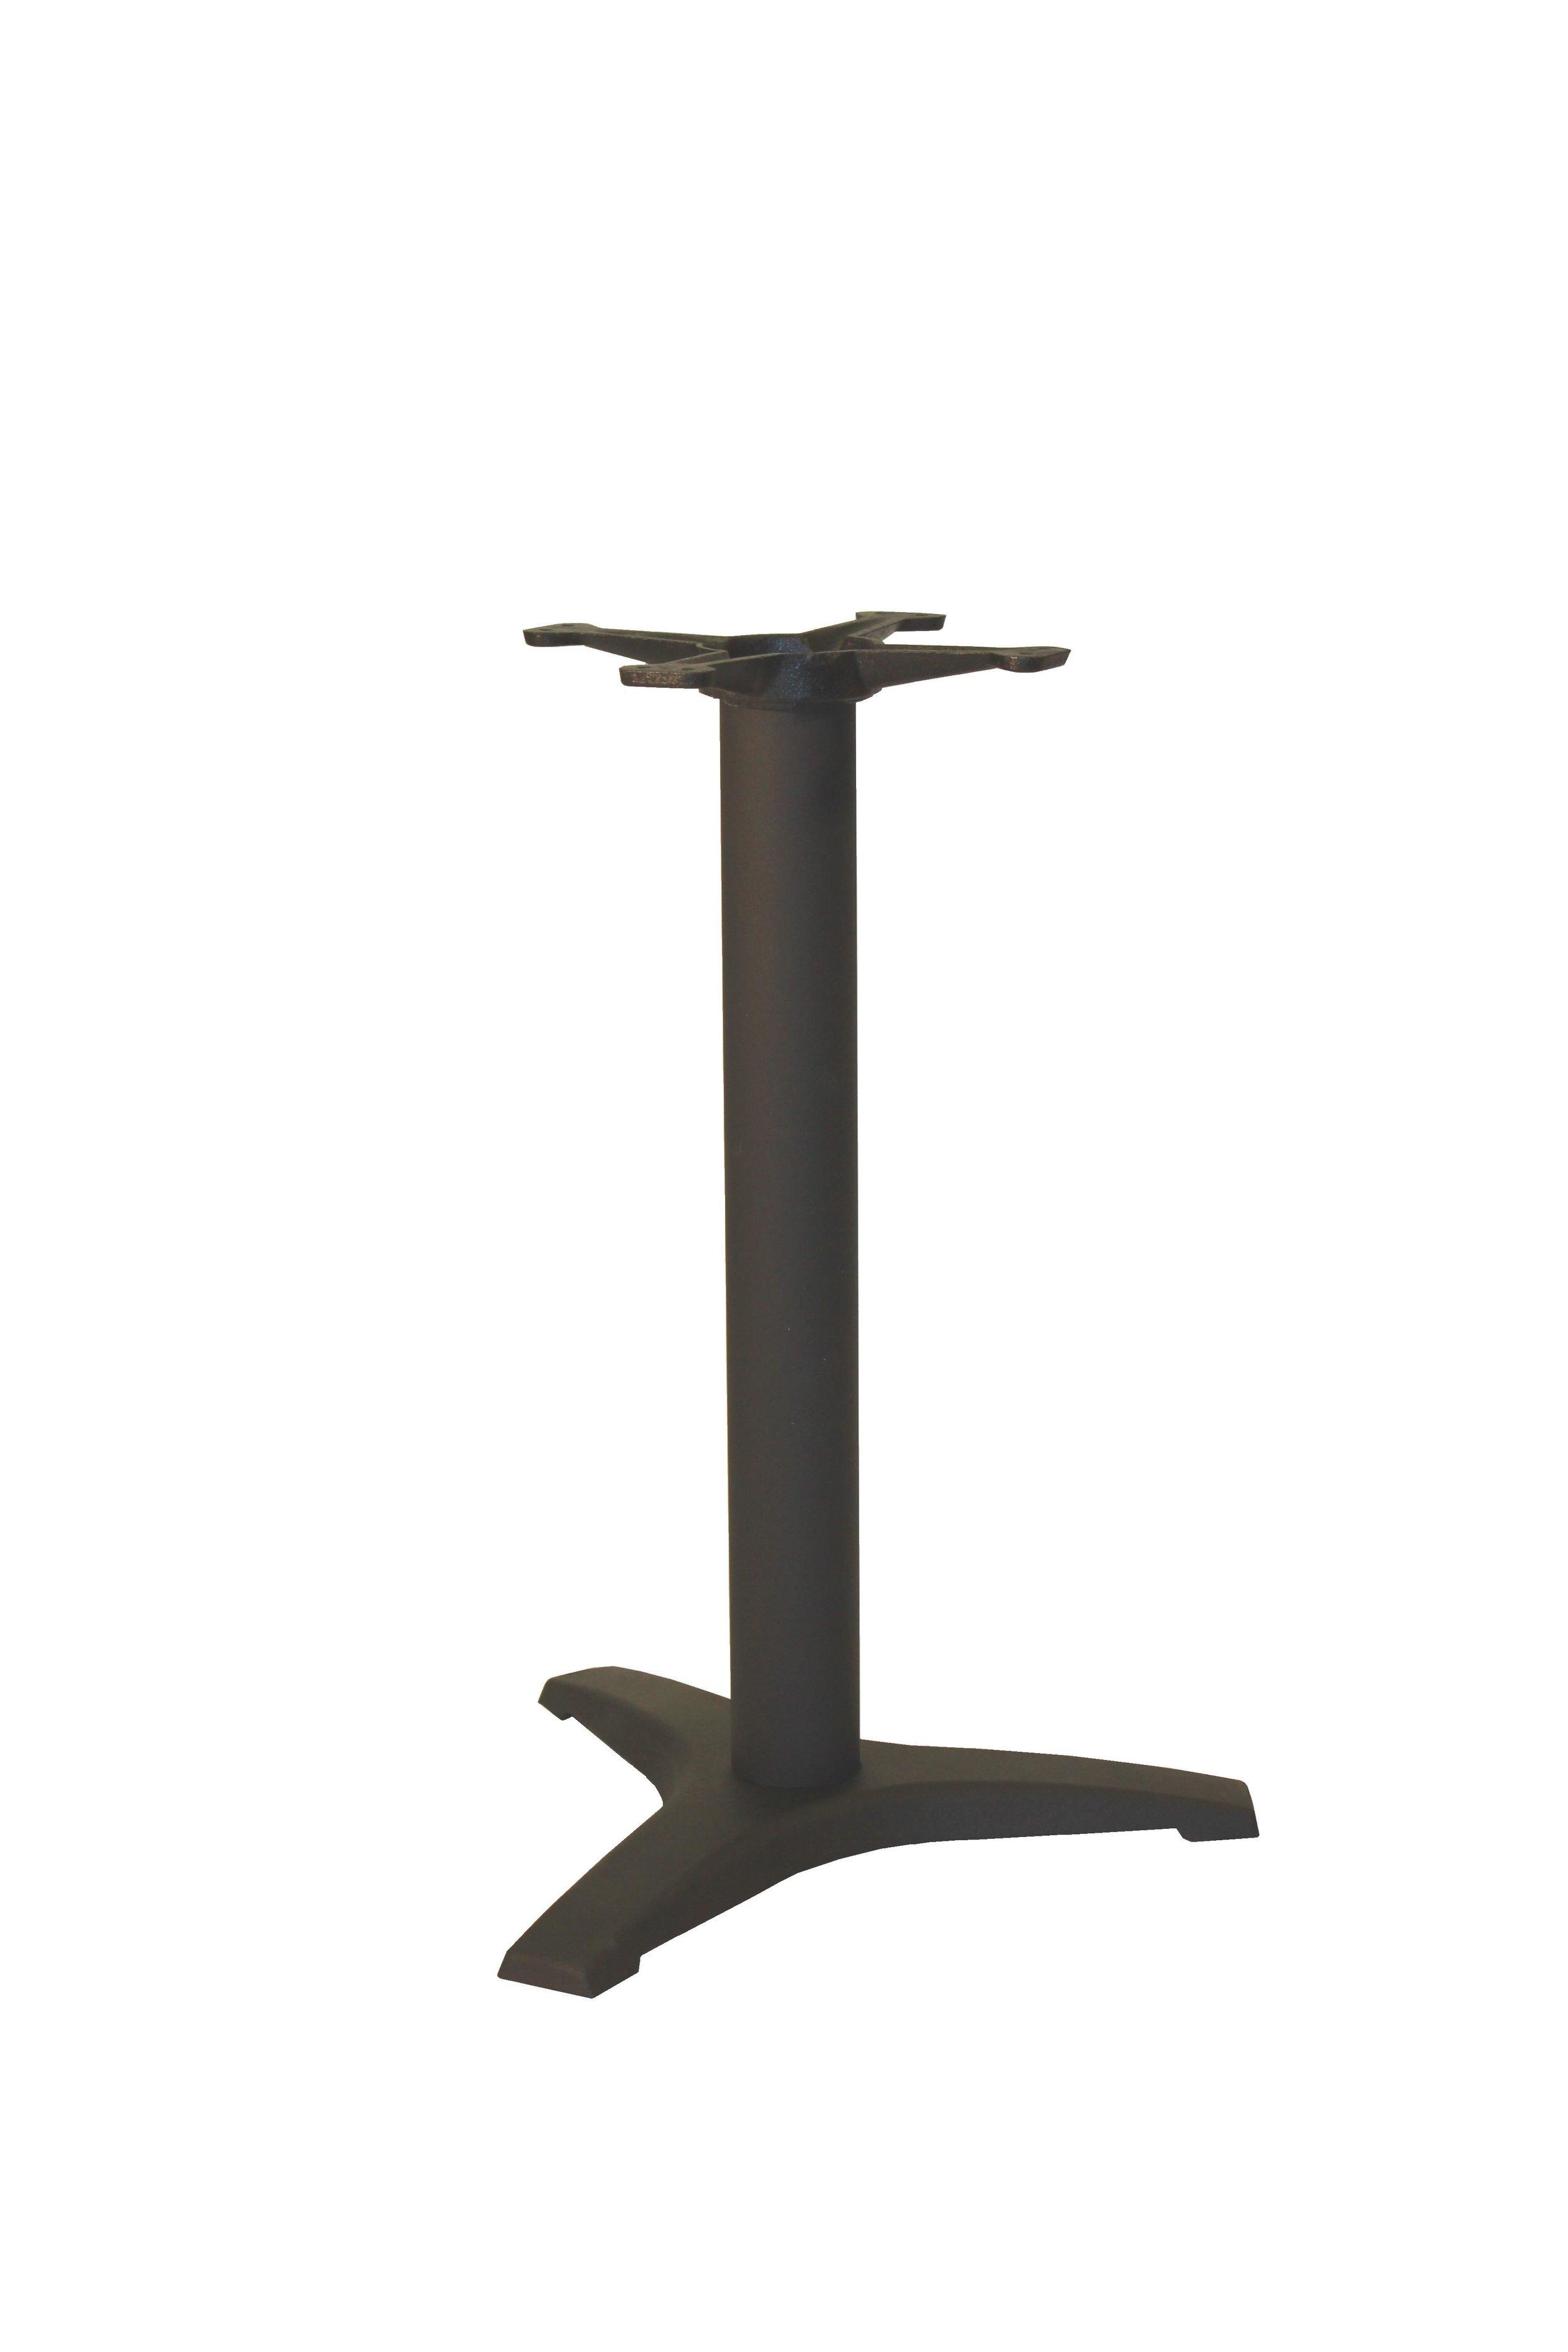 B12 - Cast Iron Table Base/ Steel Column